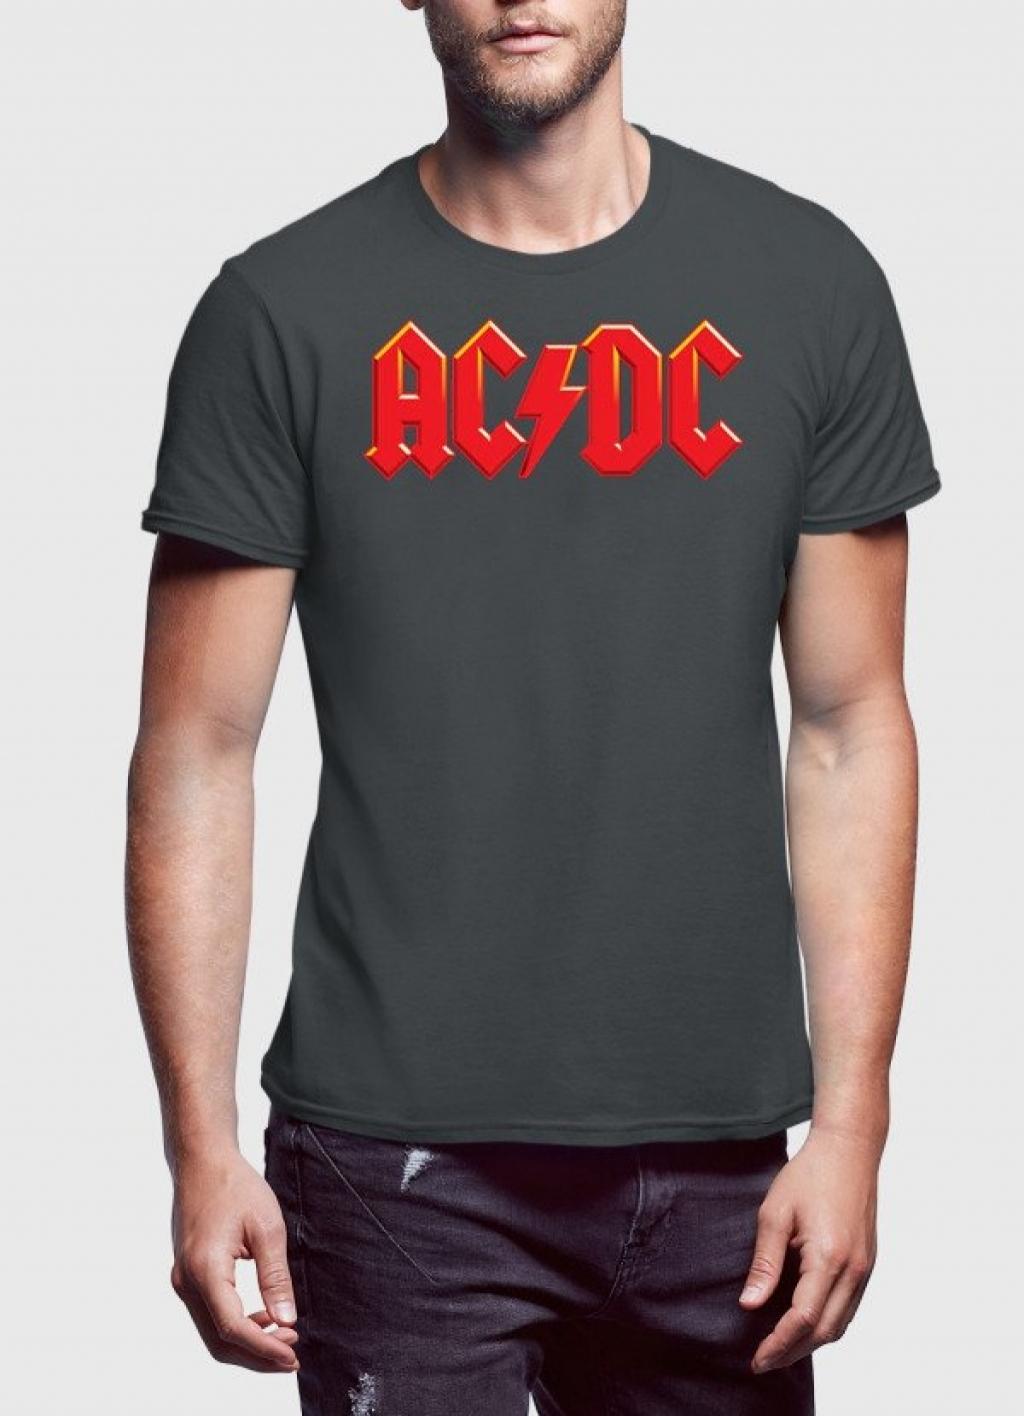 14966535990_ACDC_Back_In_Red_Half_Sleeve_Men_T-Shirt-grey.jpg